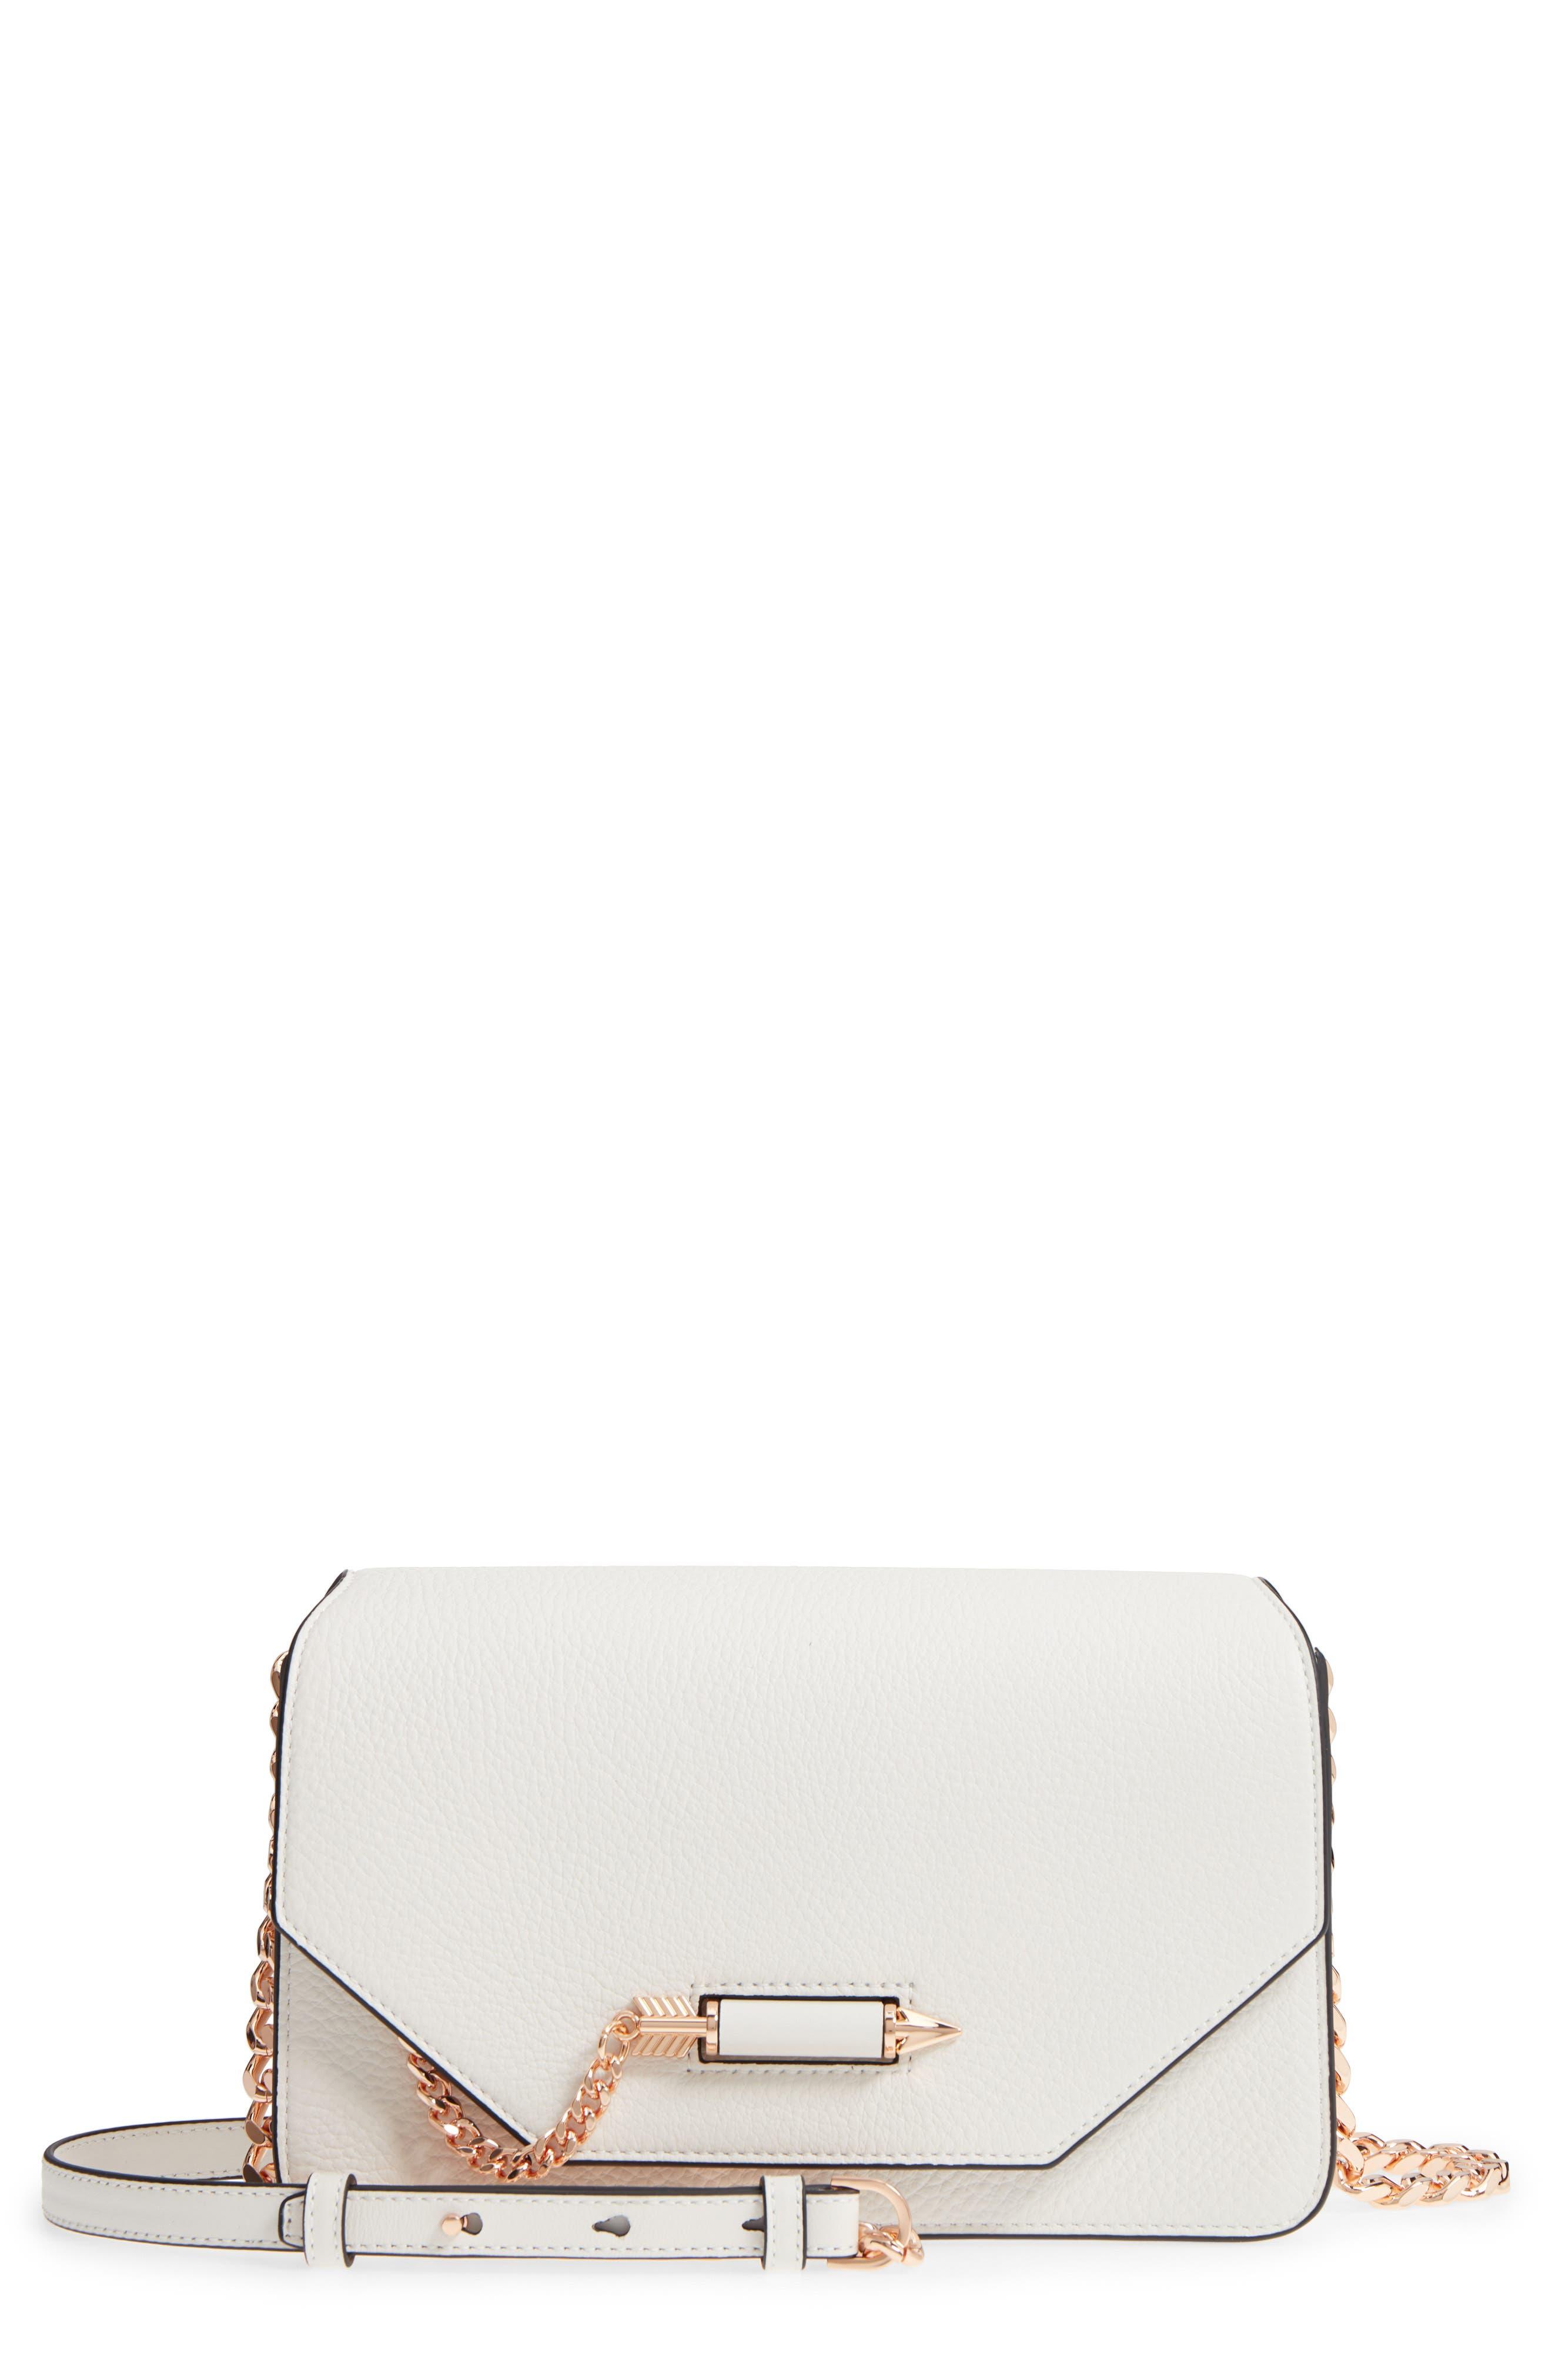 Cortney Nappa Leather Shoulder/Crossbody Bag,                         Main,                         color, White/ Rose Gold